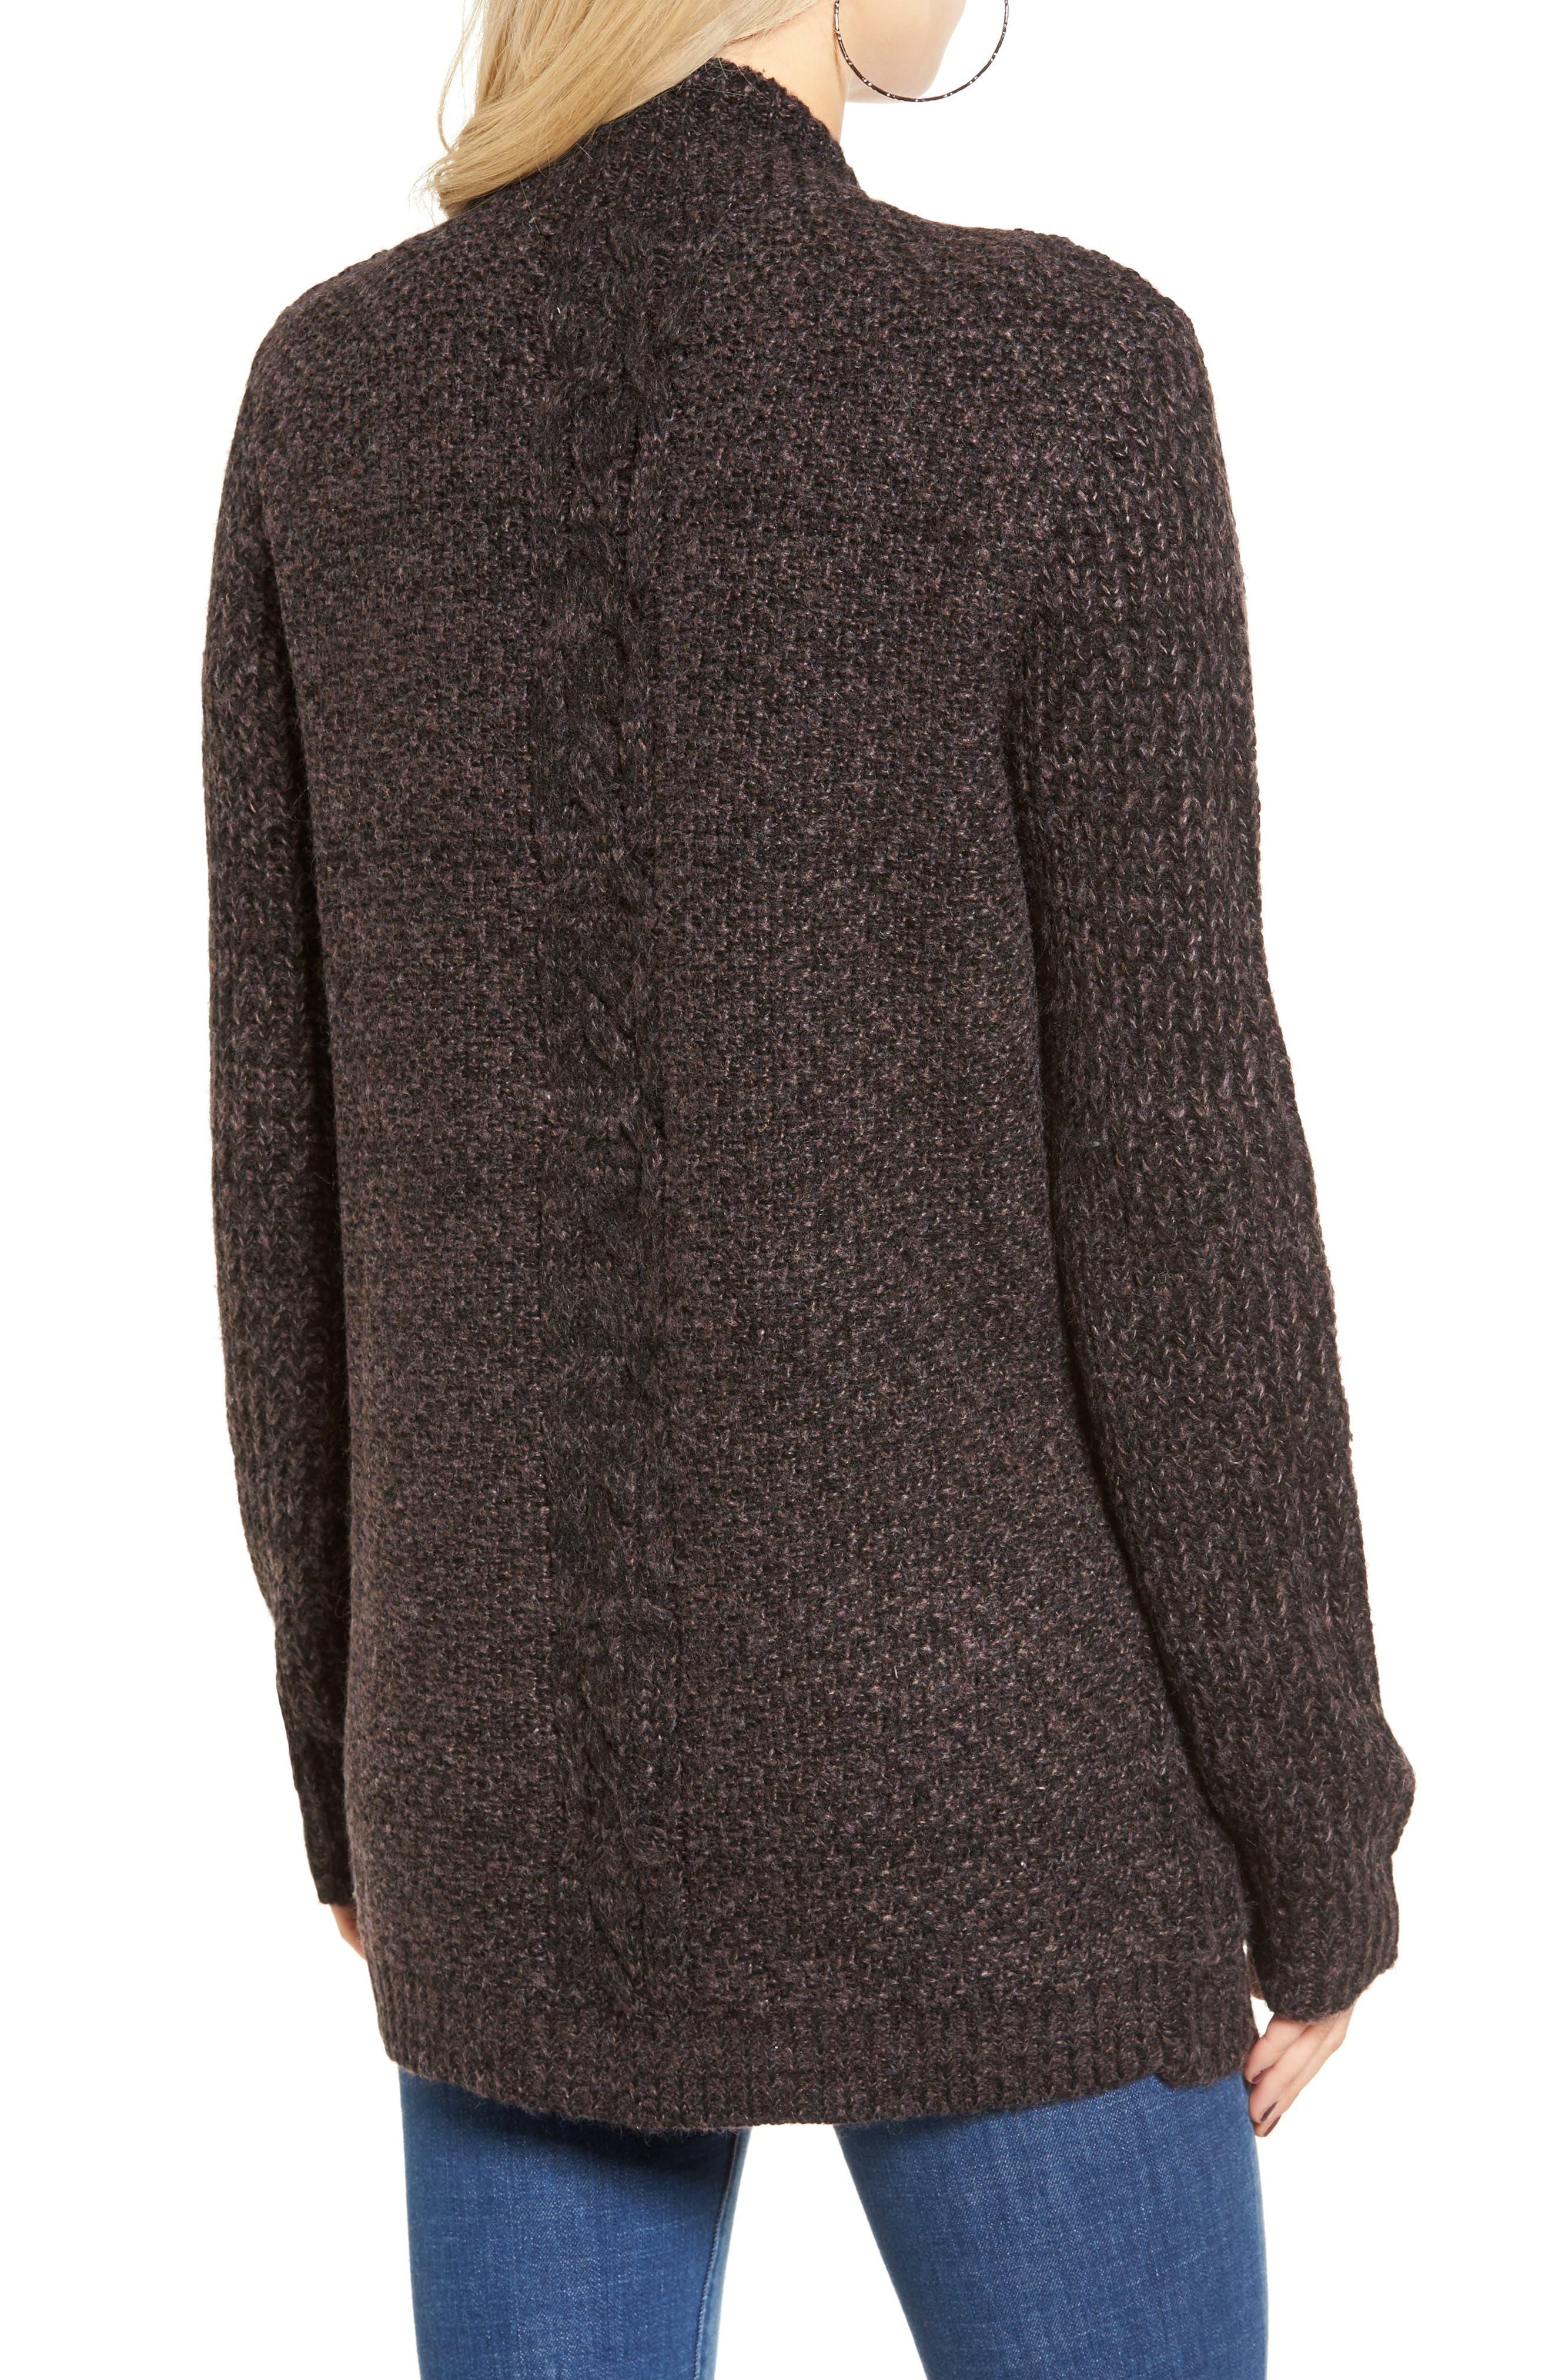 COTTON EMPORIUM,                             Marled Knit Open Cardigan,                             Alternate thumbnail 2, color,                             001